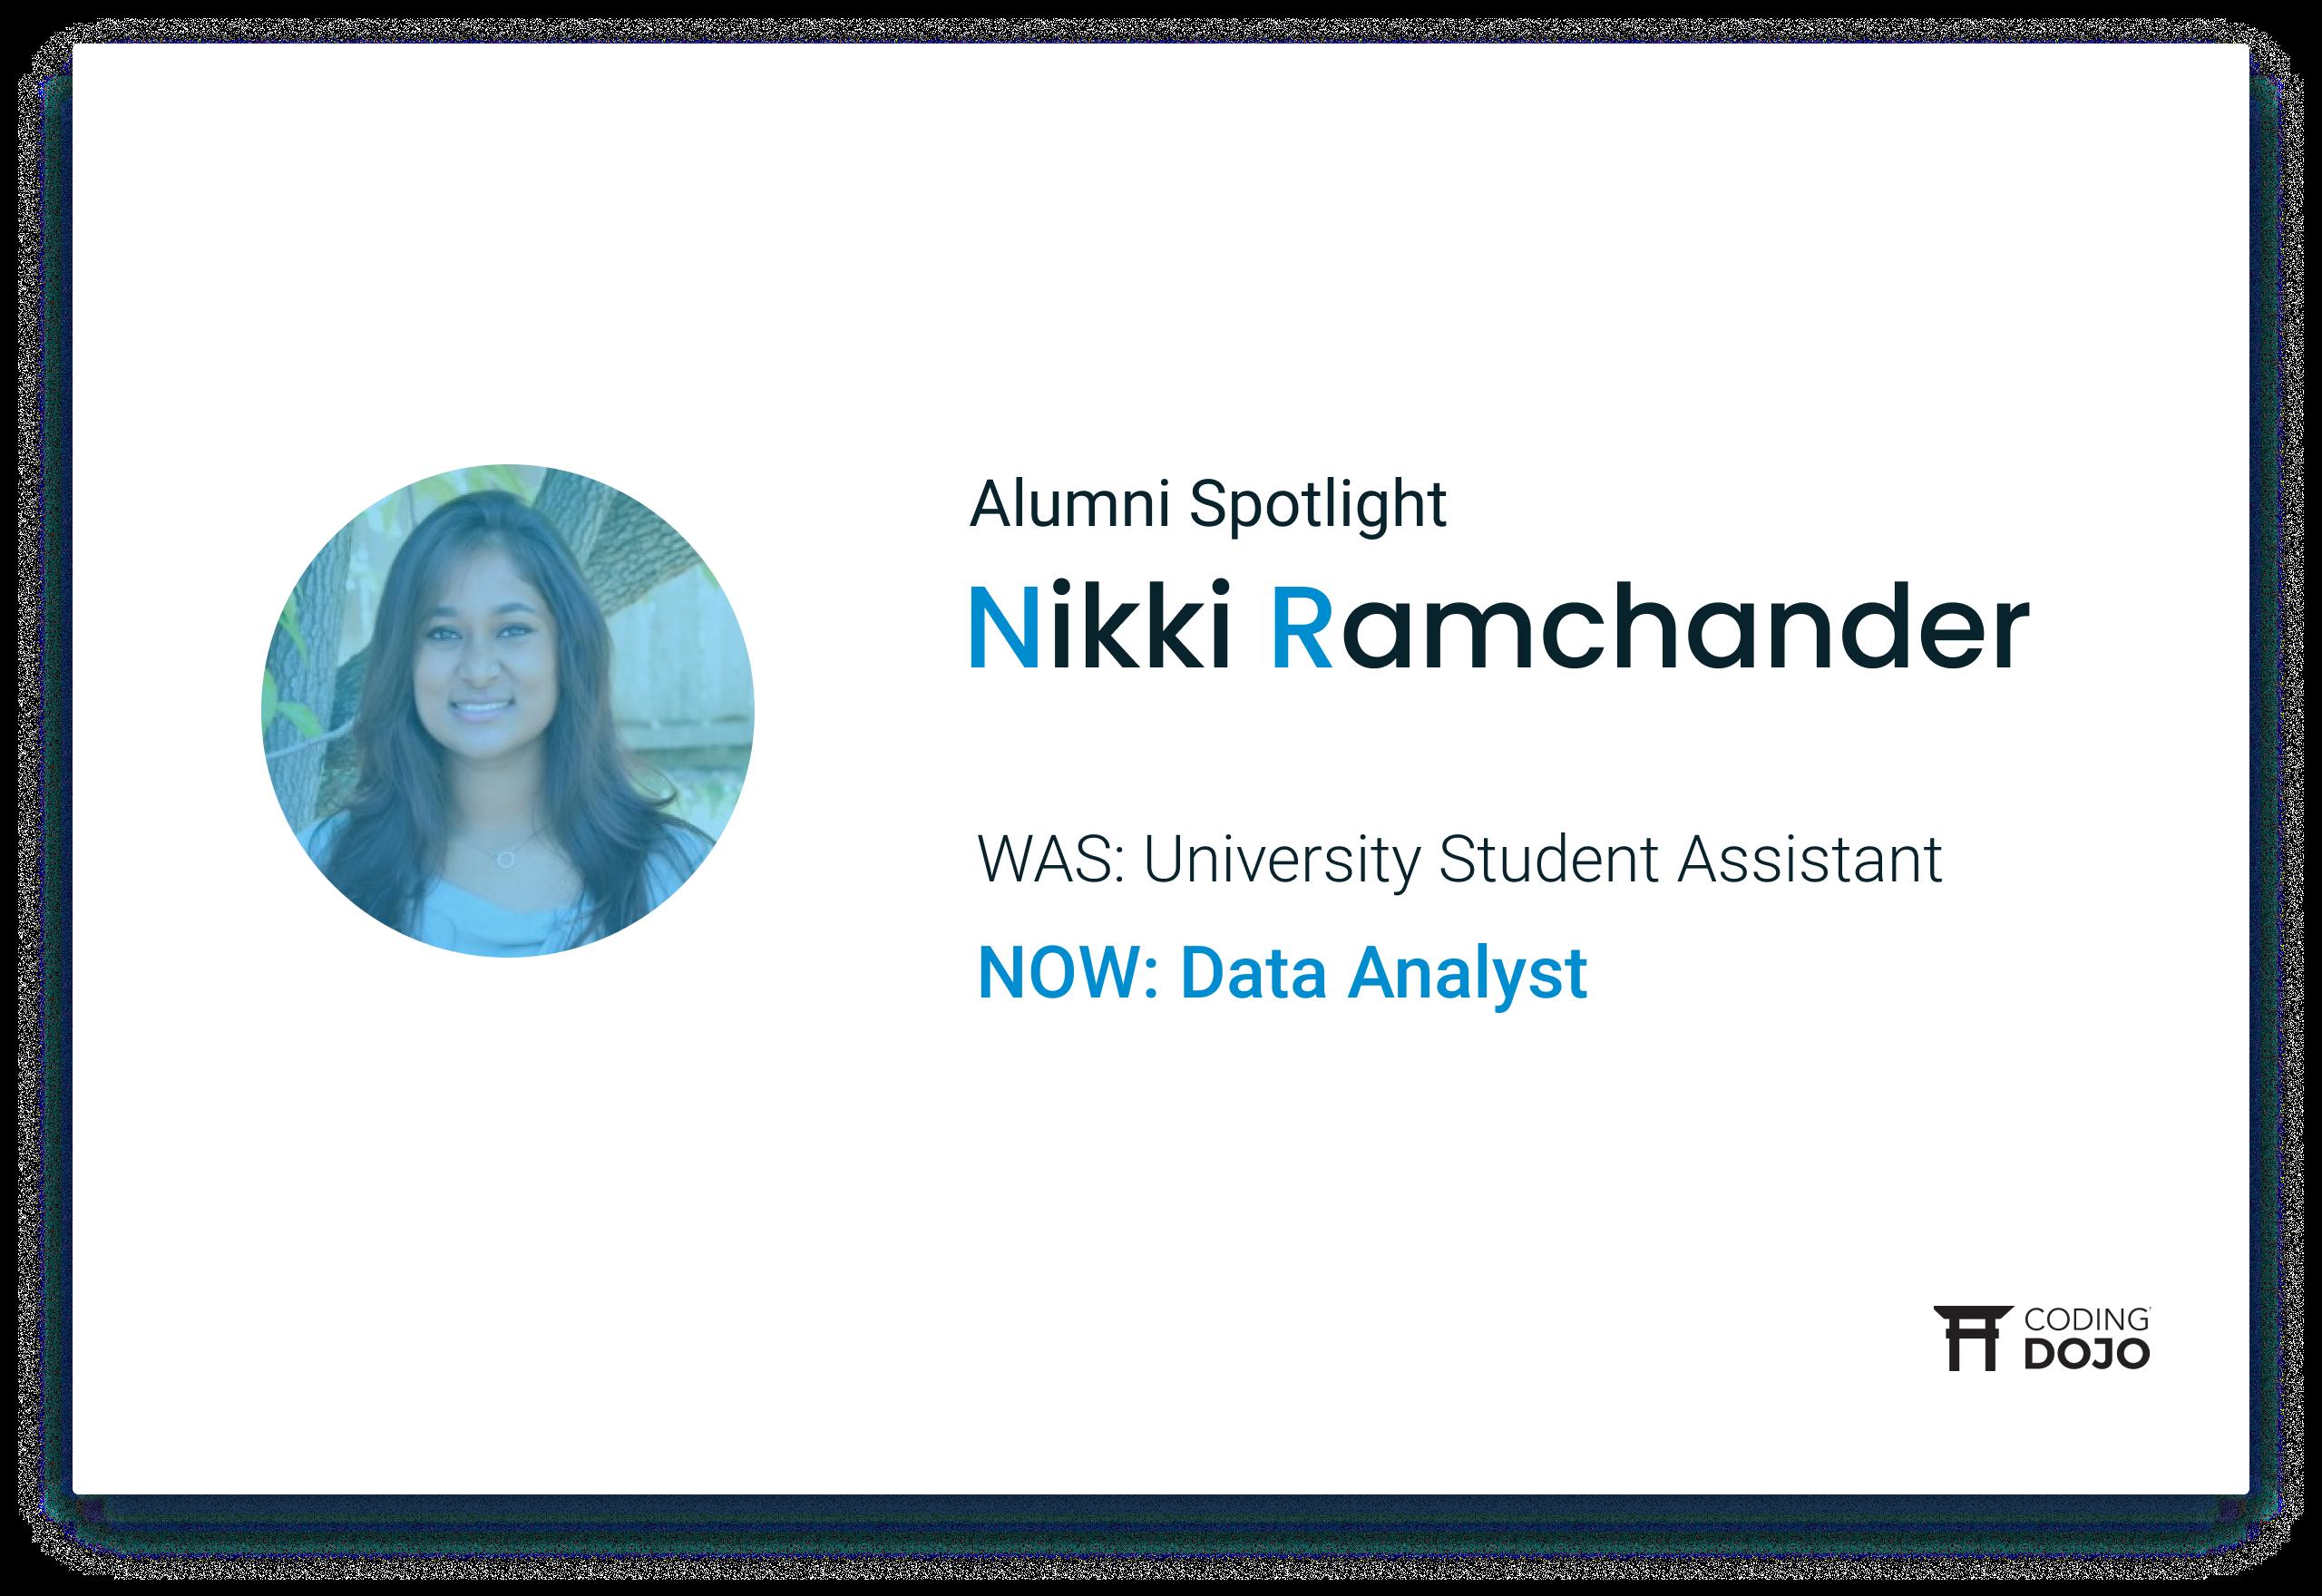 From Academia to Data Analyst | How Data Science Alumna Nikki Ramchander Found Her Dream Industry